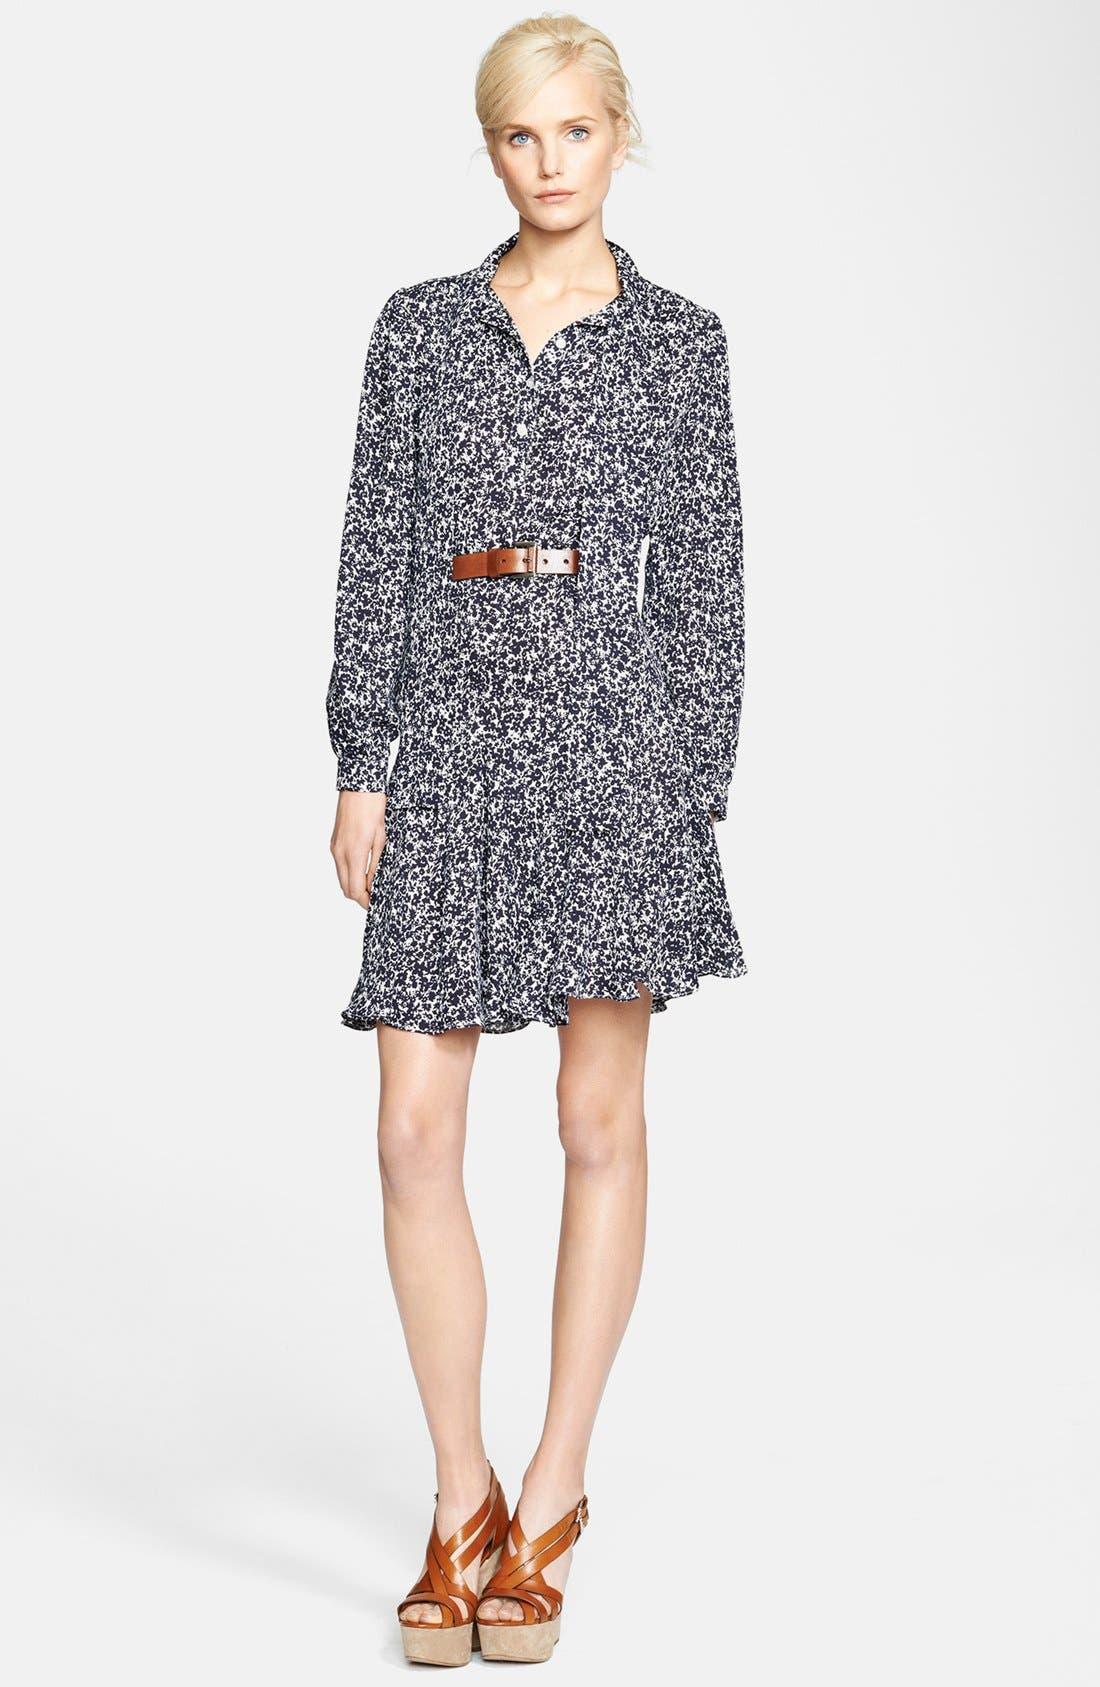 Main Image - Michael Kors Print Silk Georgette Dress